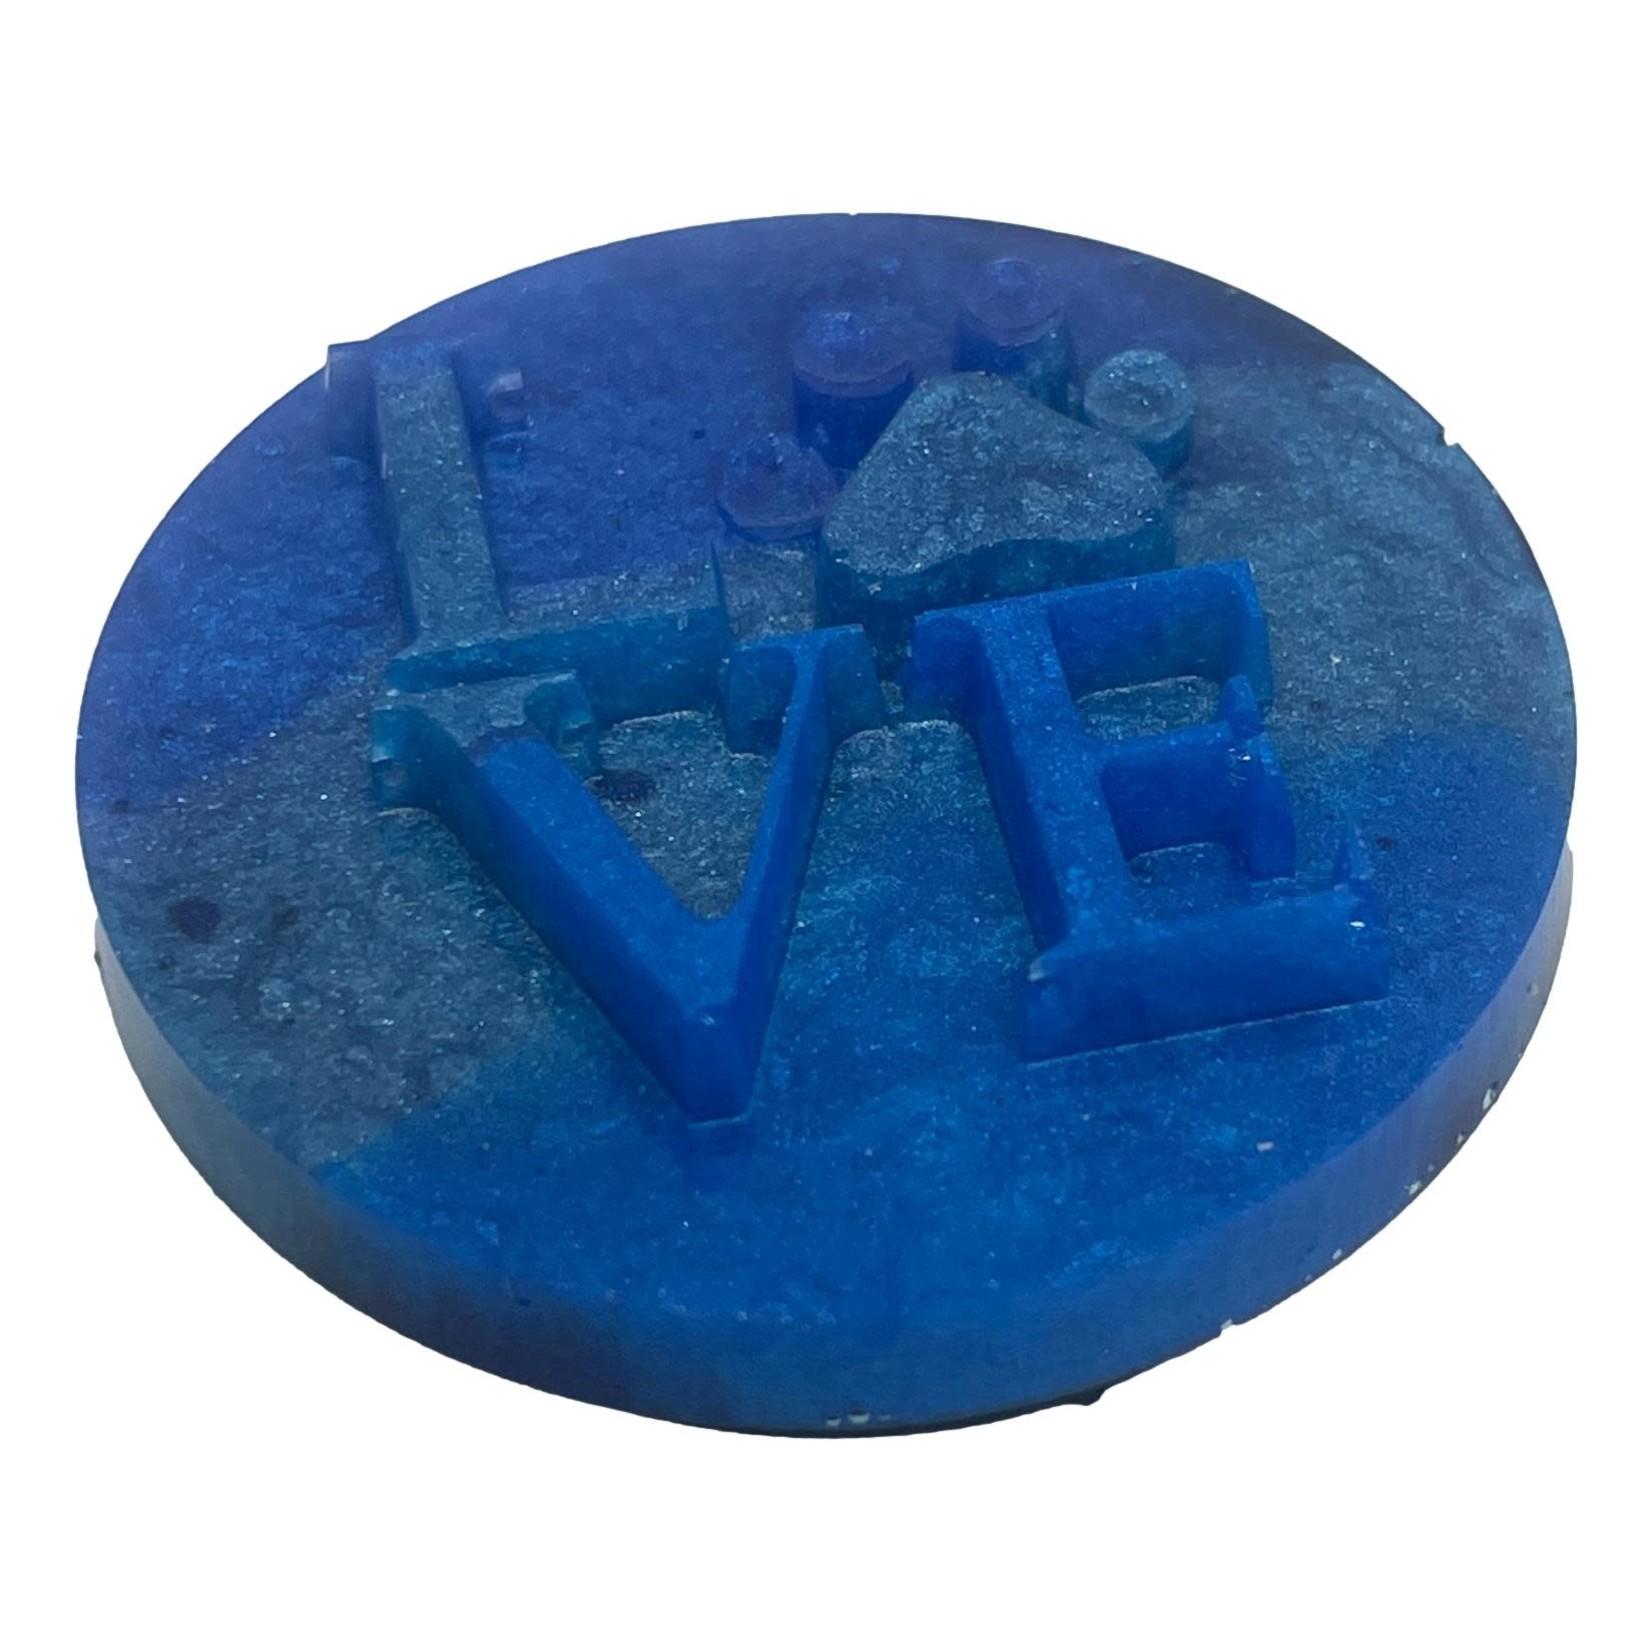 East Coast Sirens Three-tone Blue Puppy Love Phone Grip